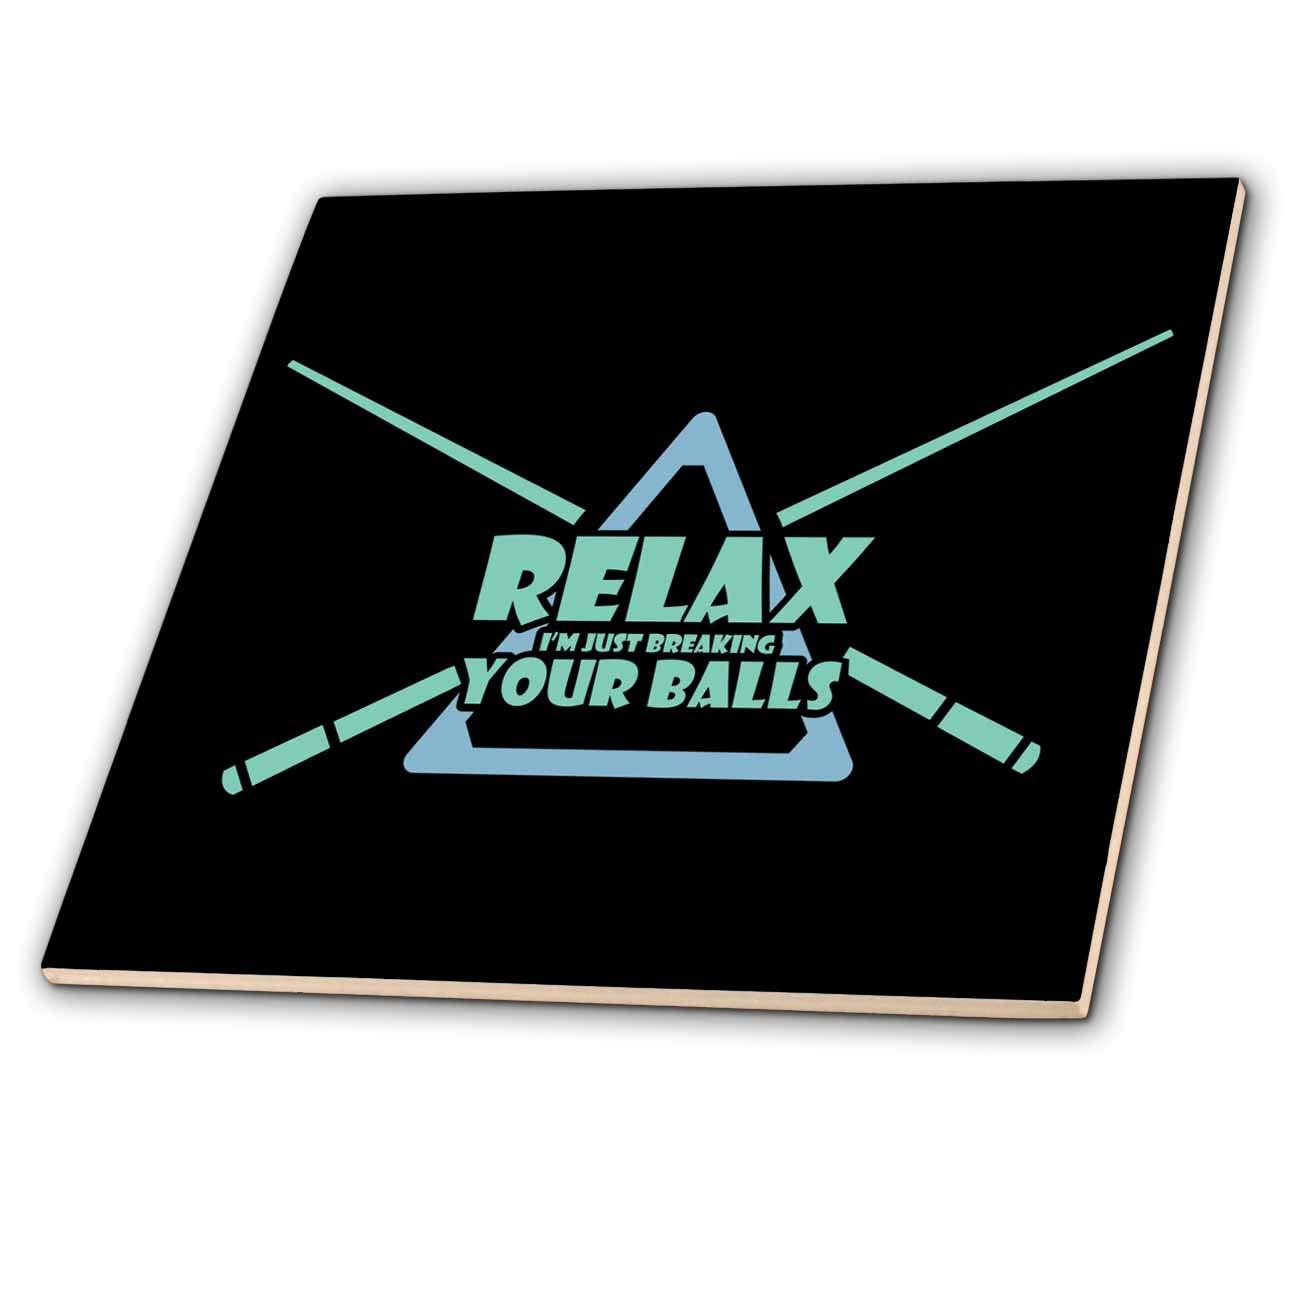 3dRose Sven Herkenrath Billiard - Relax Iam Just Breaking your Balls Pool Billiard Snooker - 8 Inch Glass Tile (ct_320751_7)